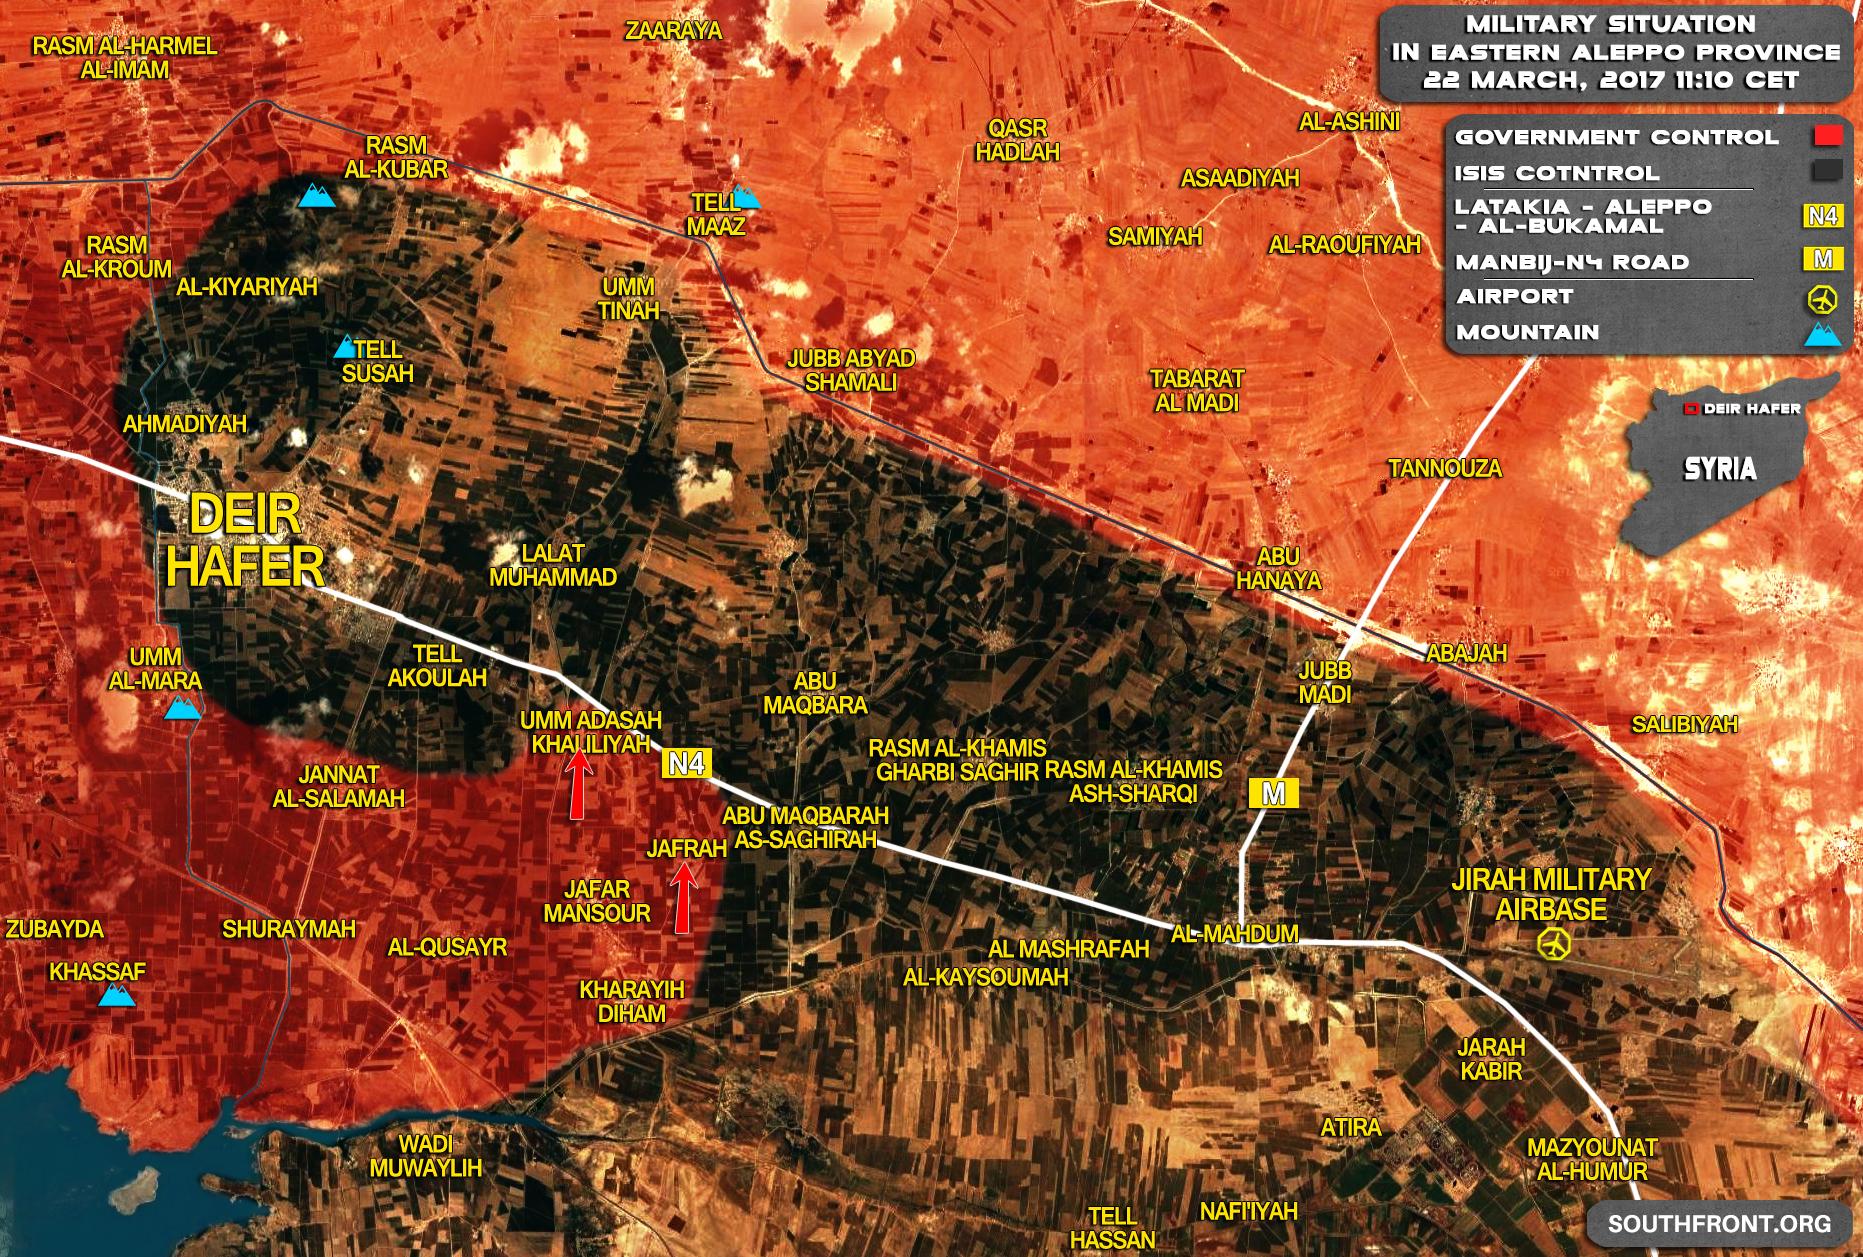 Tiger Forces Capture Umm Adasah Khaliliyah, Set Control Of Deir Hafer-Mahdum Road